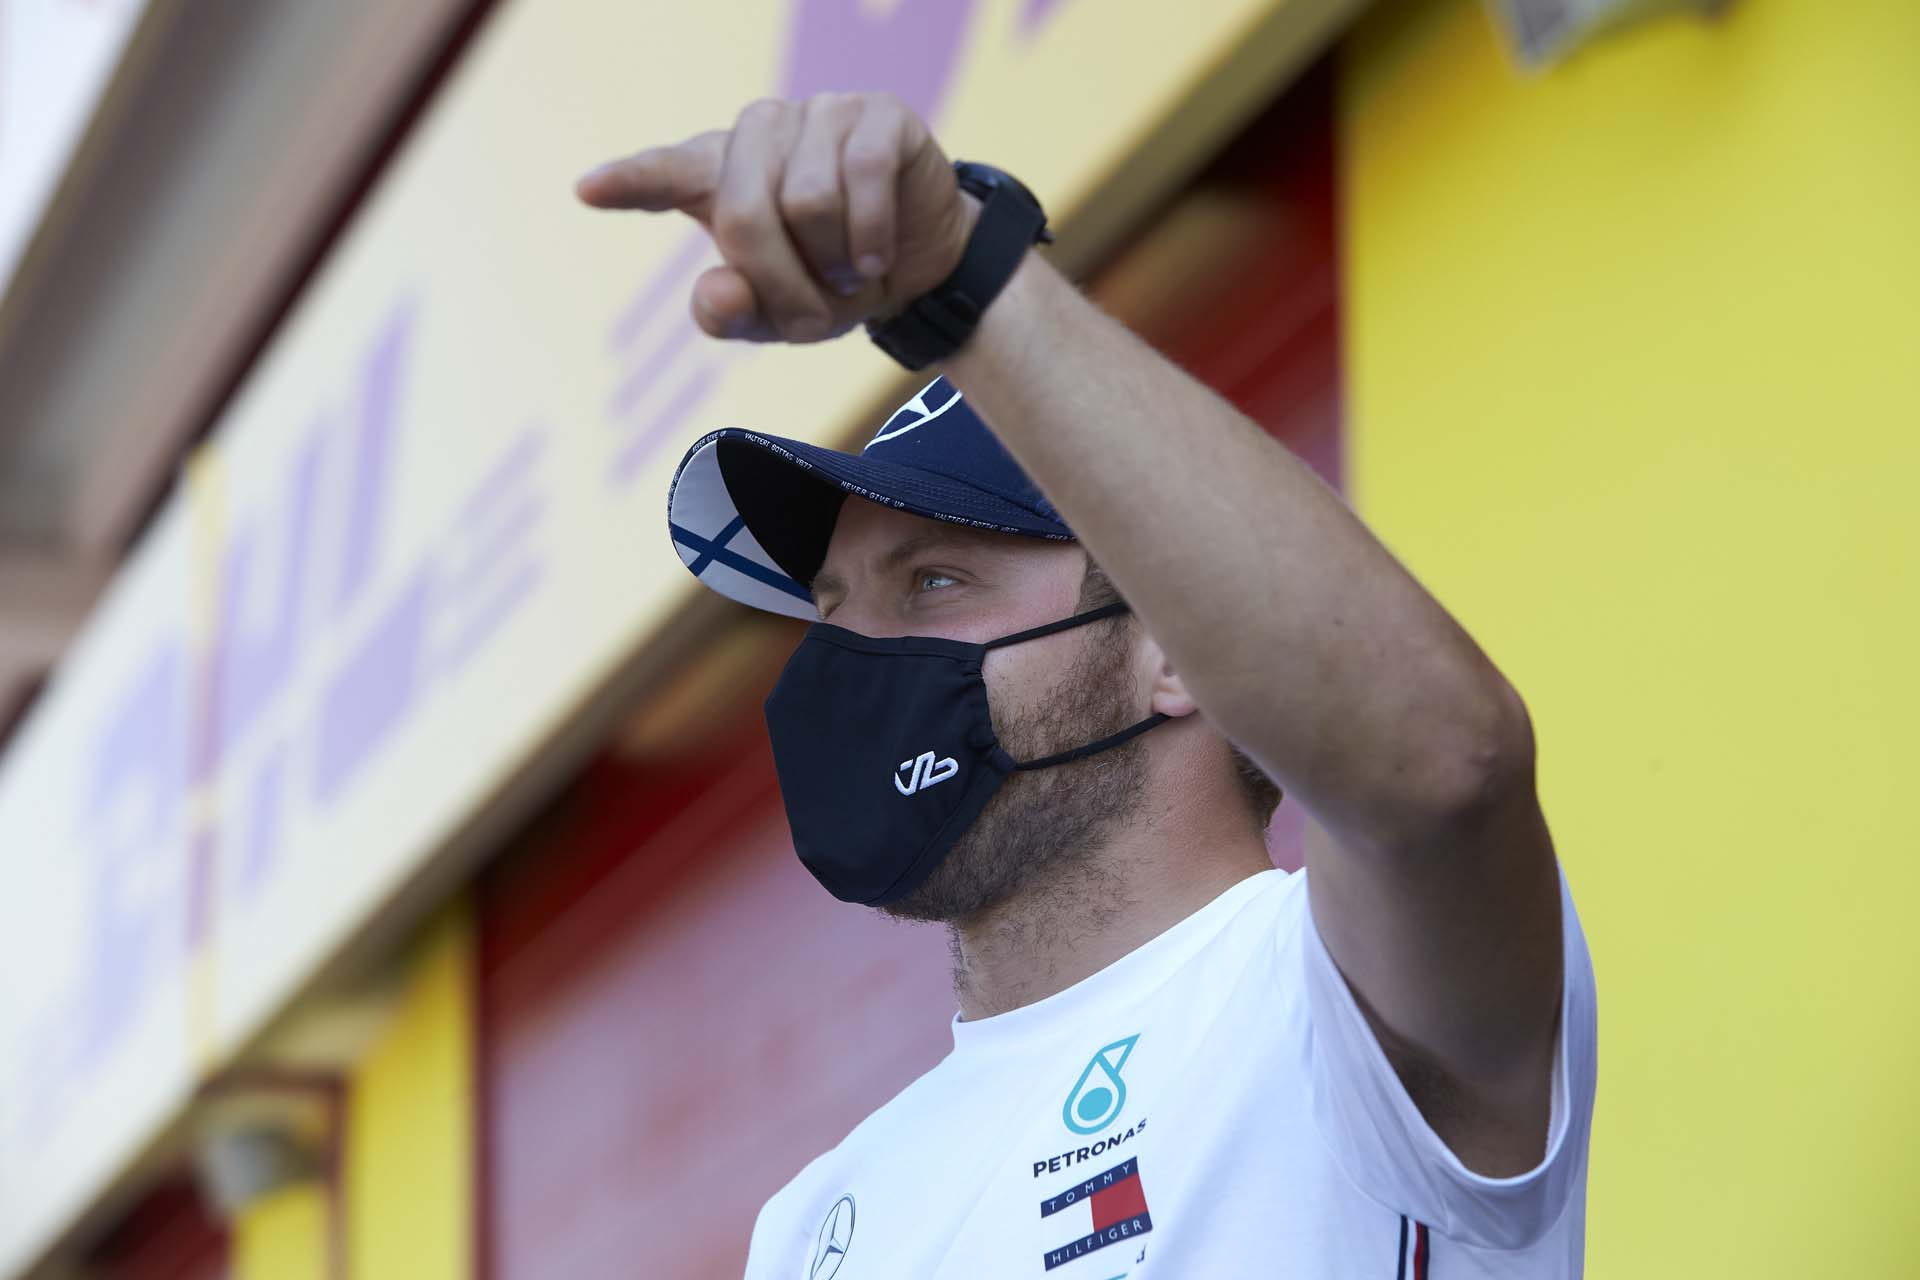 2020 Tuscan Grand Prix, Sunday - Steve Etherington